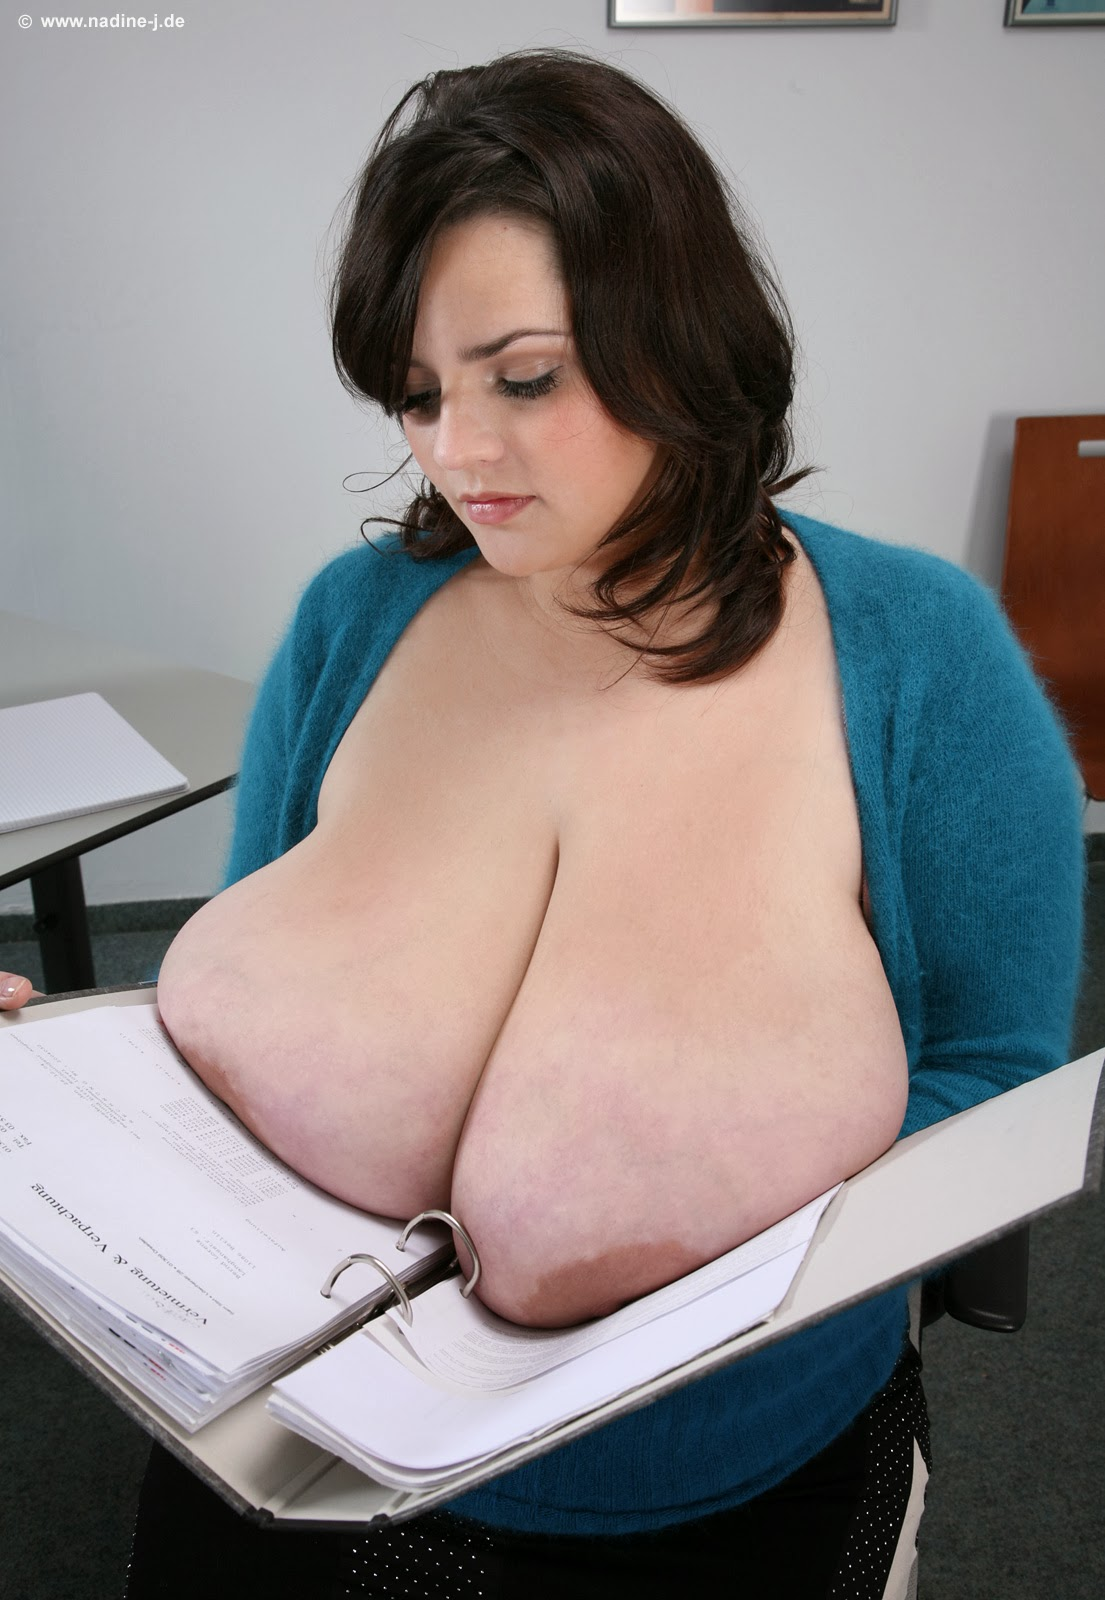 Hot, wow!!! Mega giant tits targeting